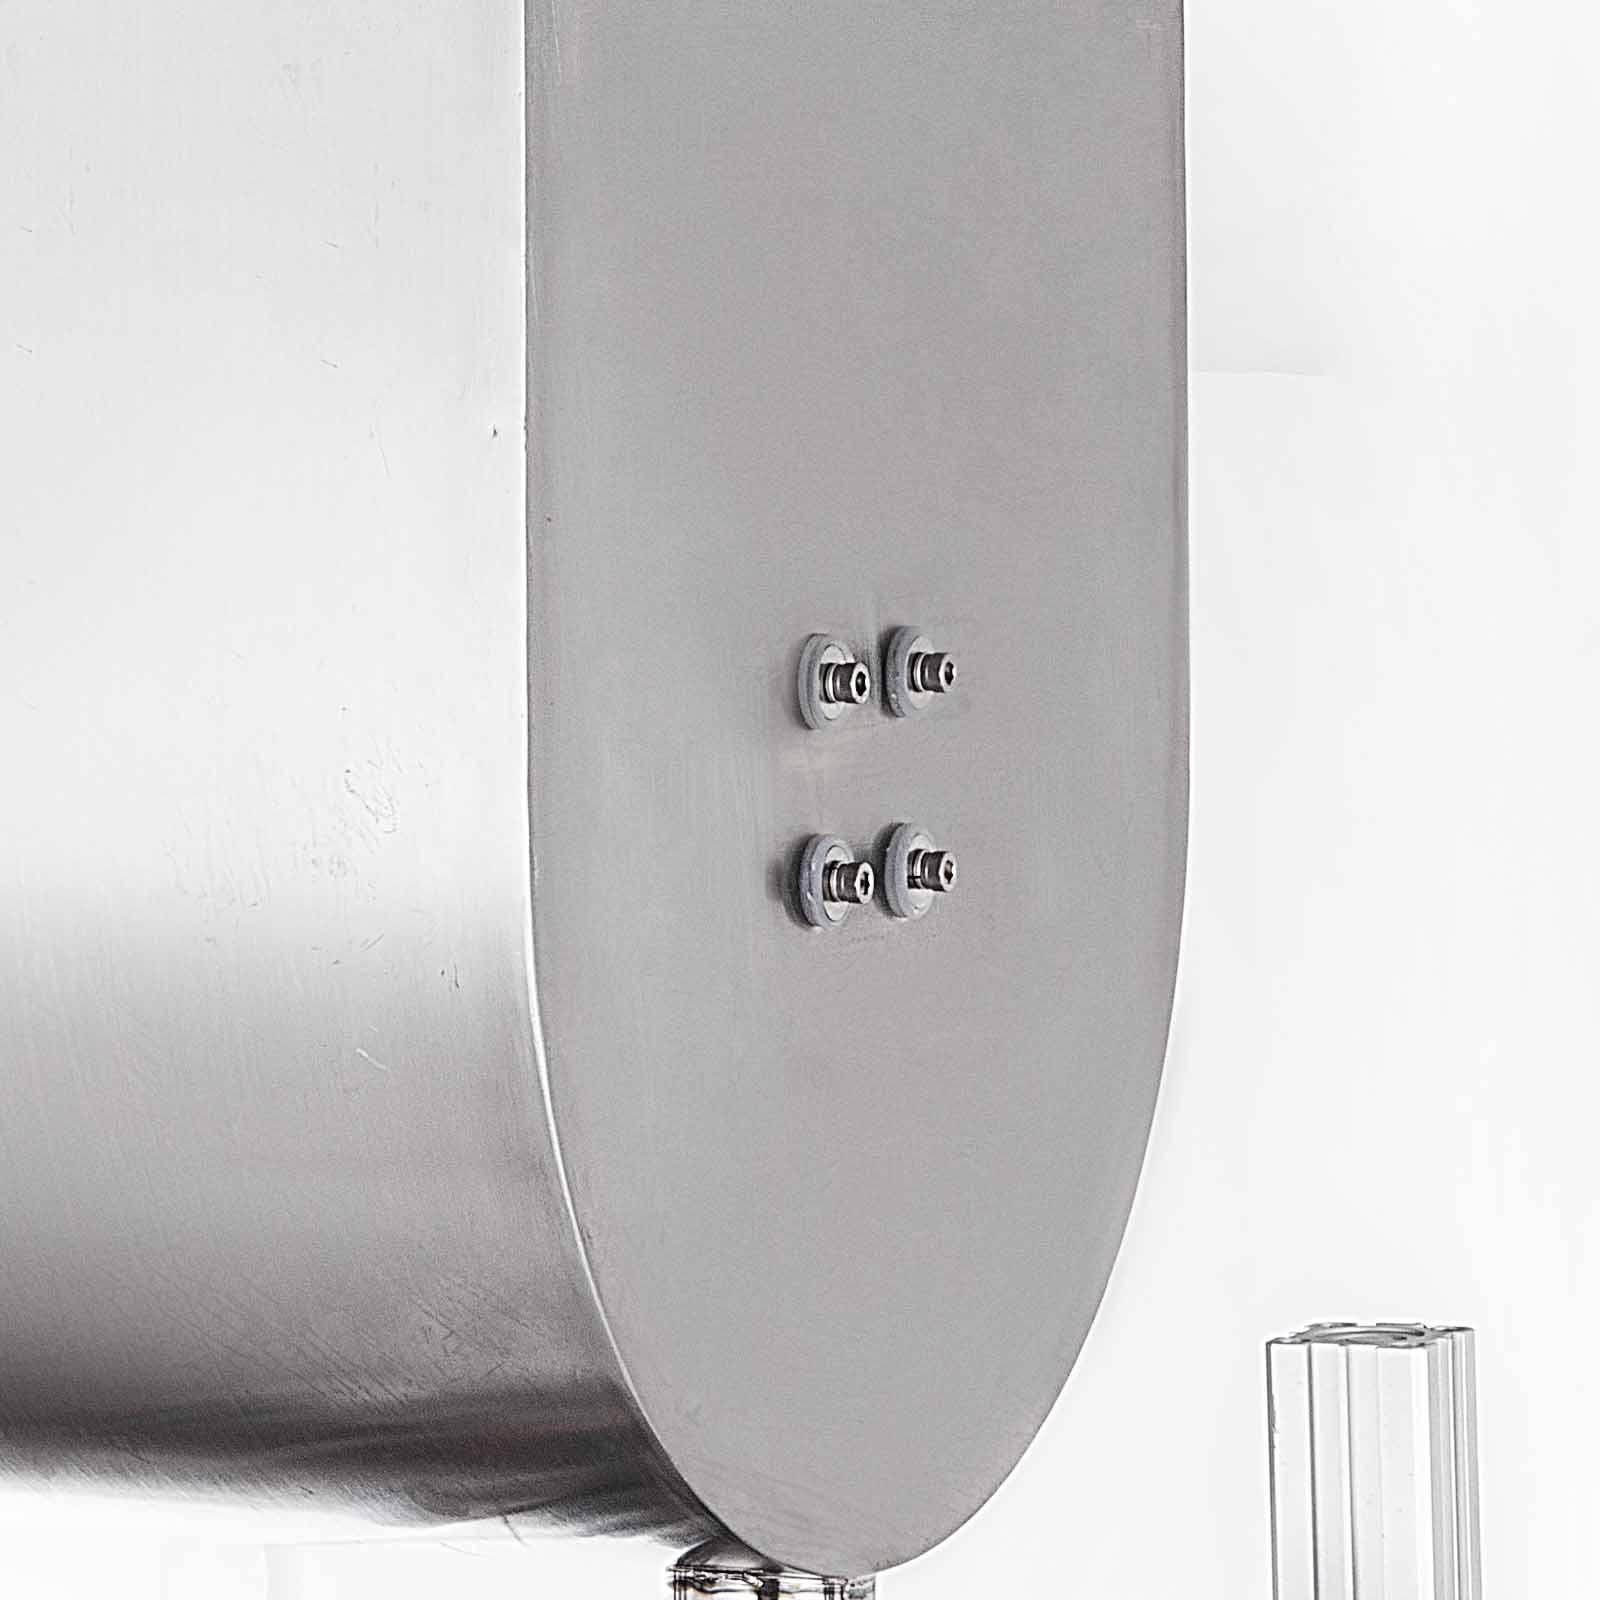 Liquid-Filling-Machine-Filler-Remplissage-2-3500ML-50-500ML-INDUSTRY-SUPPLY miniature 95